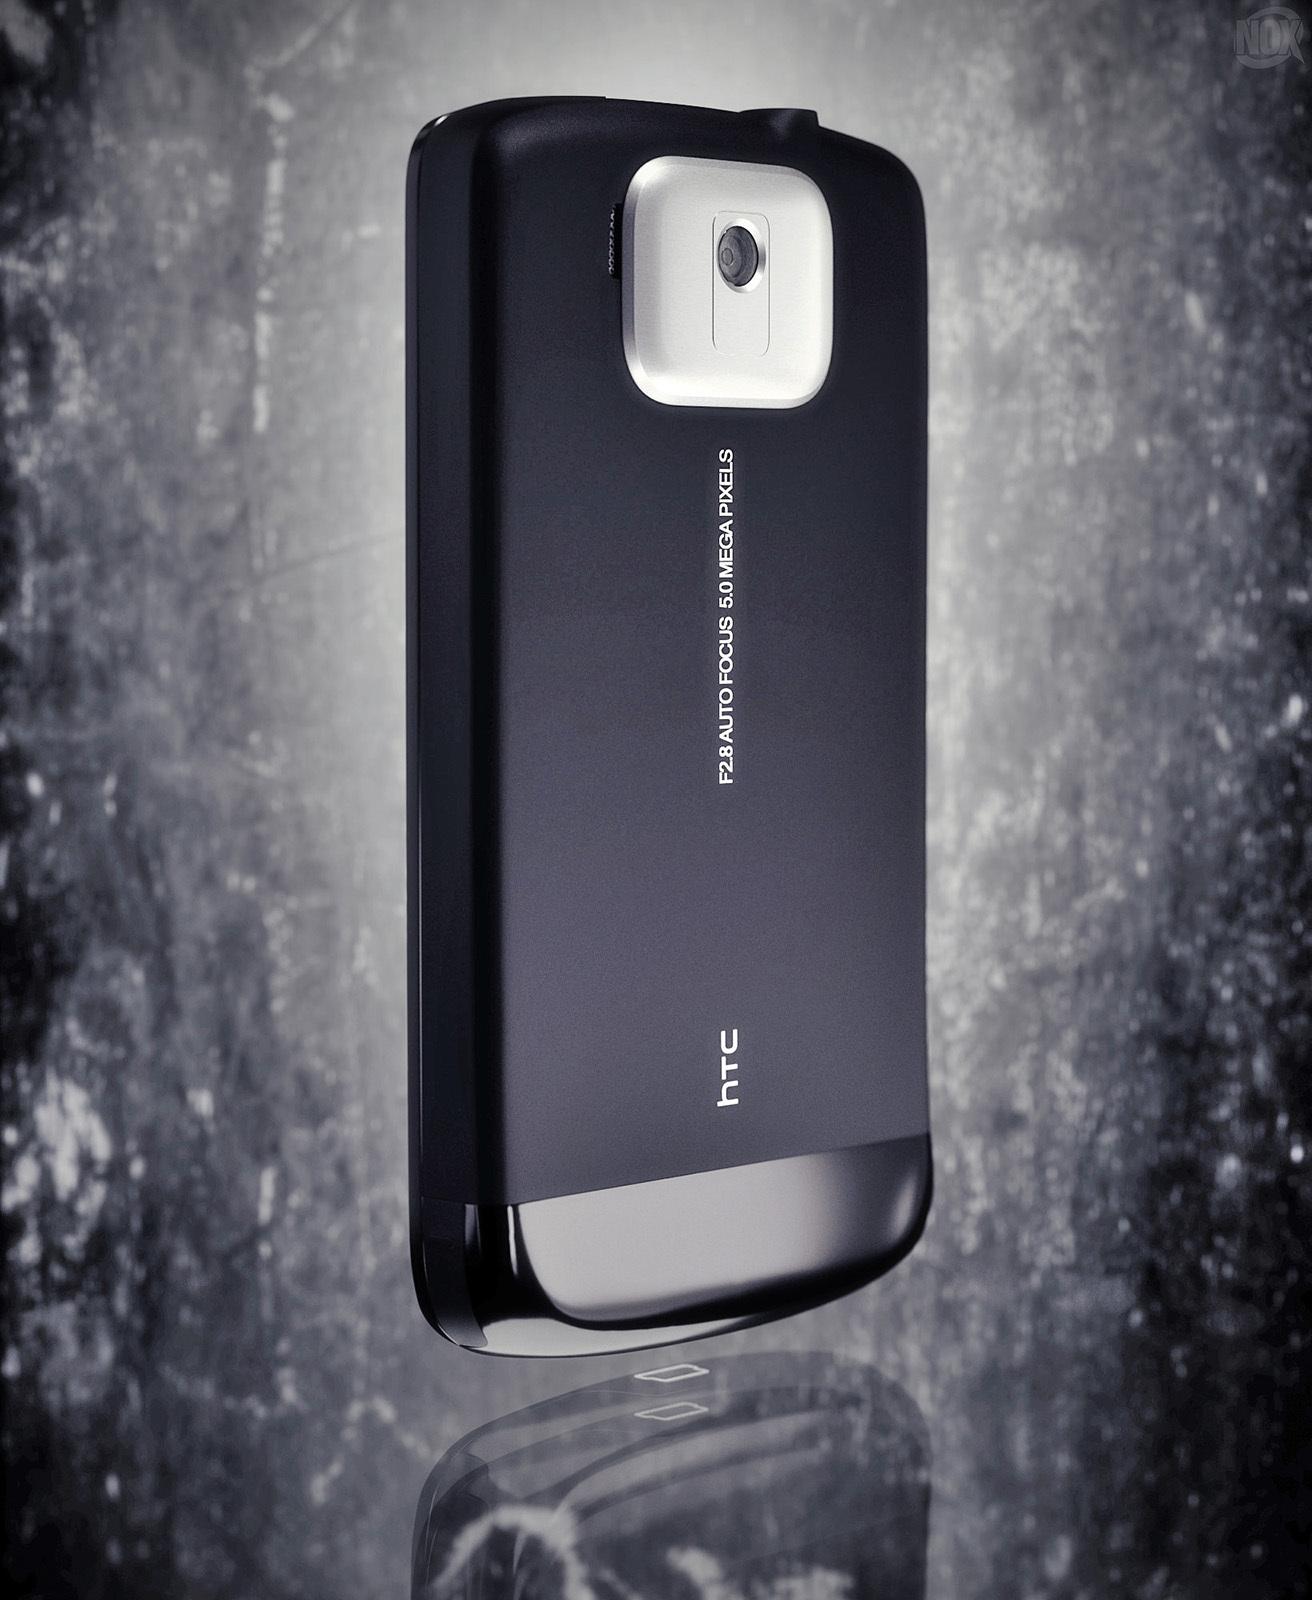 Darkblood phone in nox rendere 1 cfff2b95 aod8